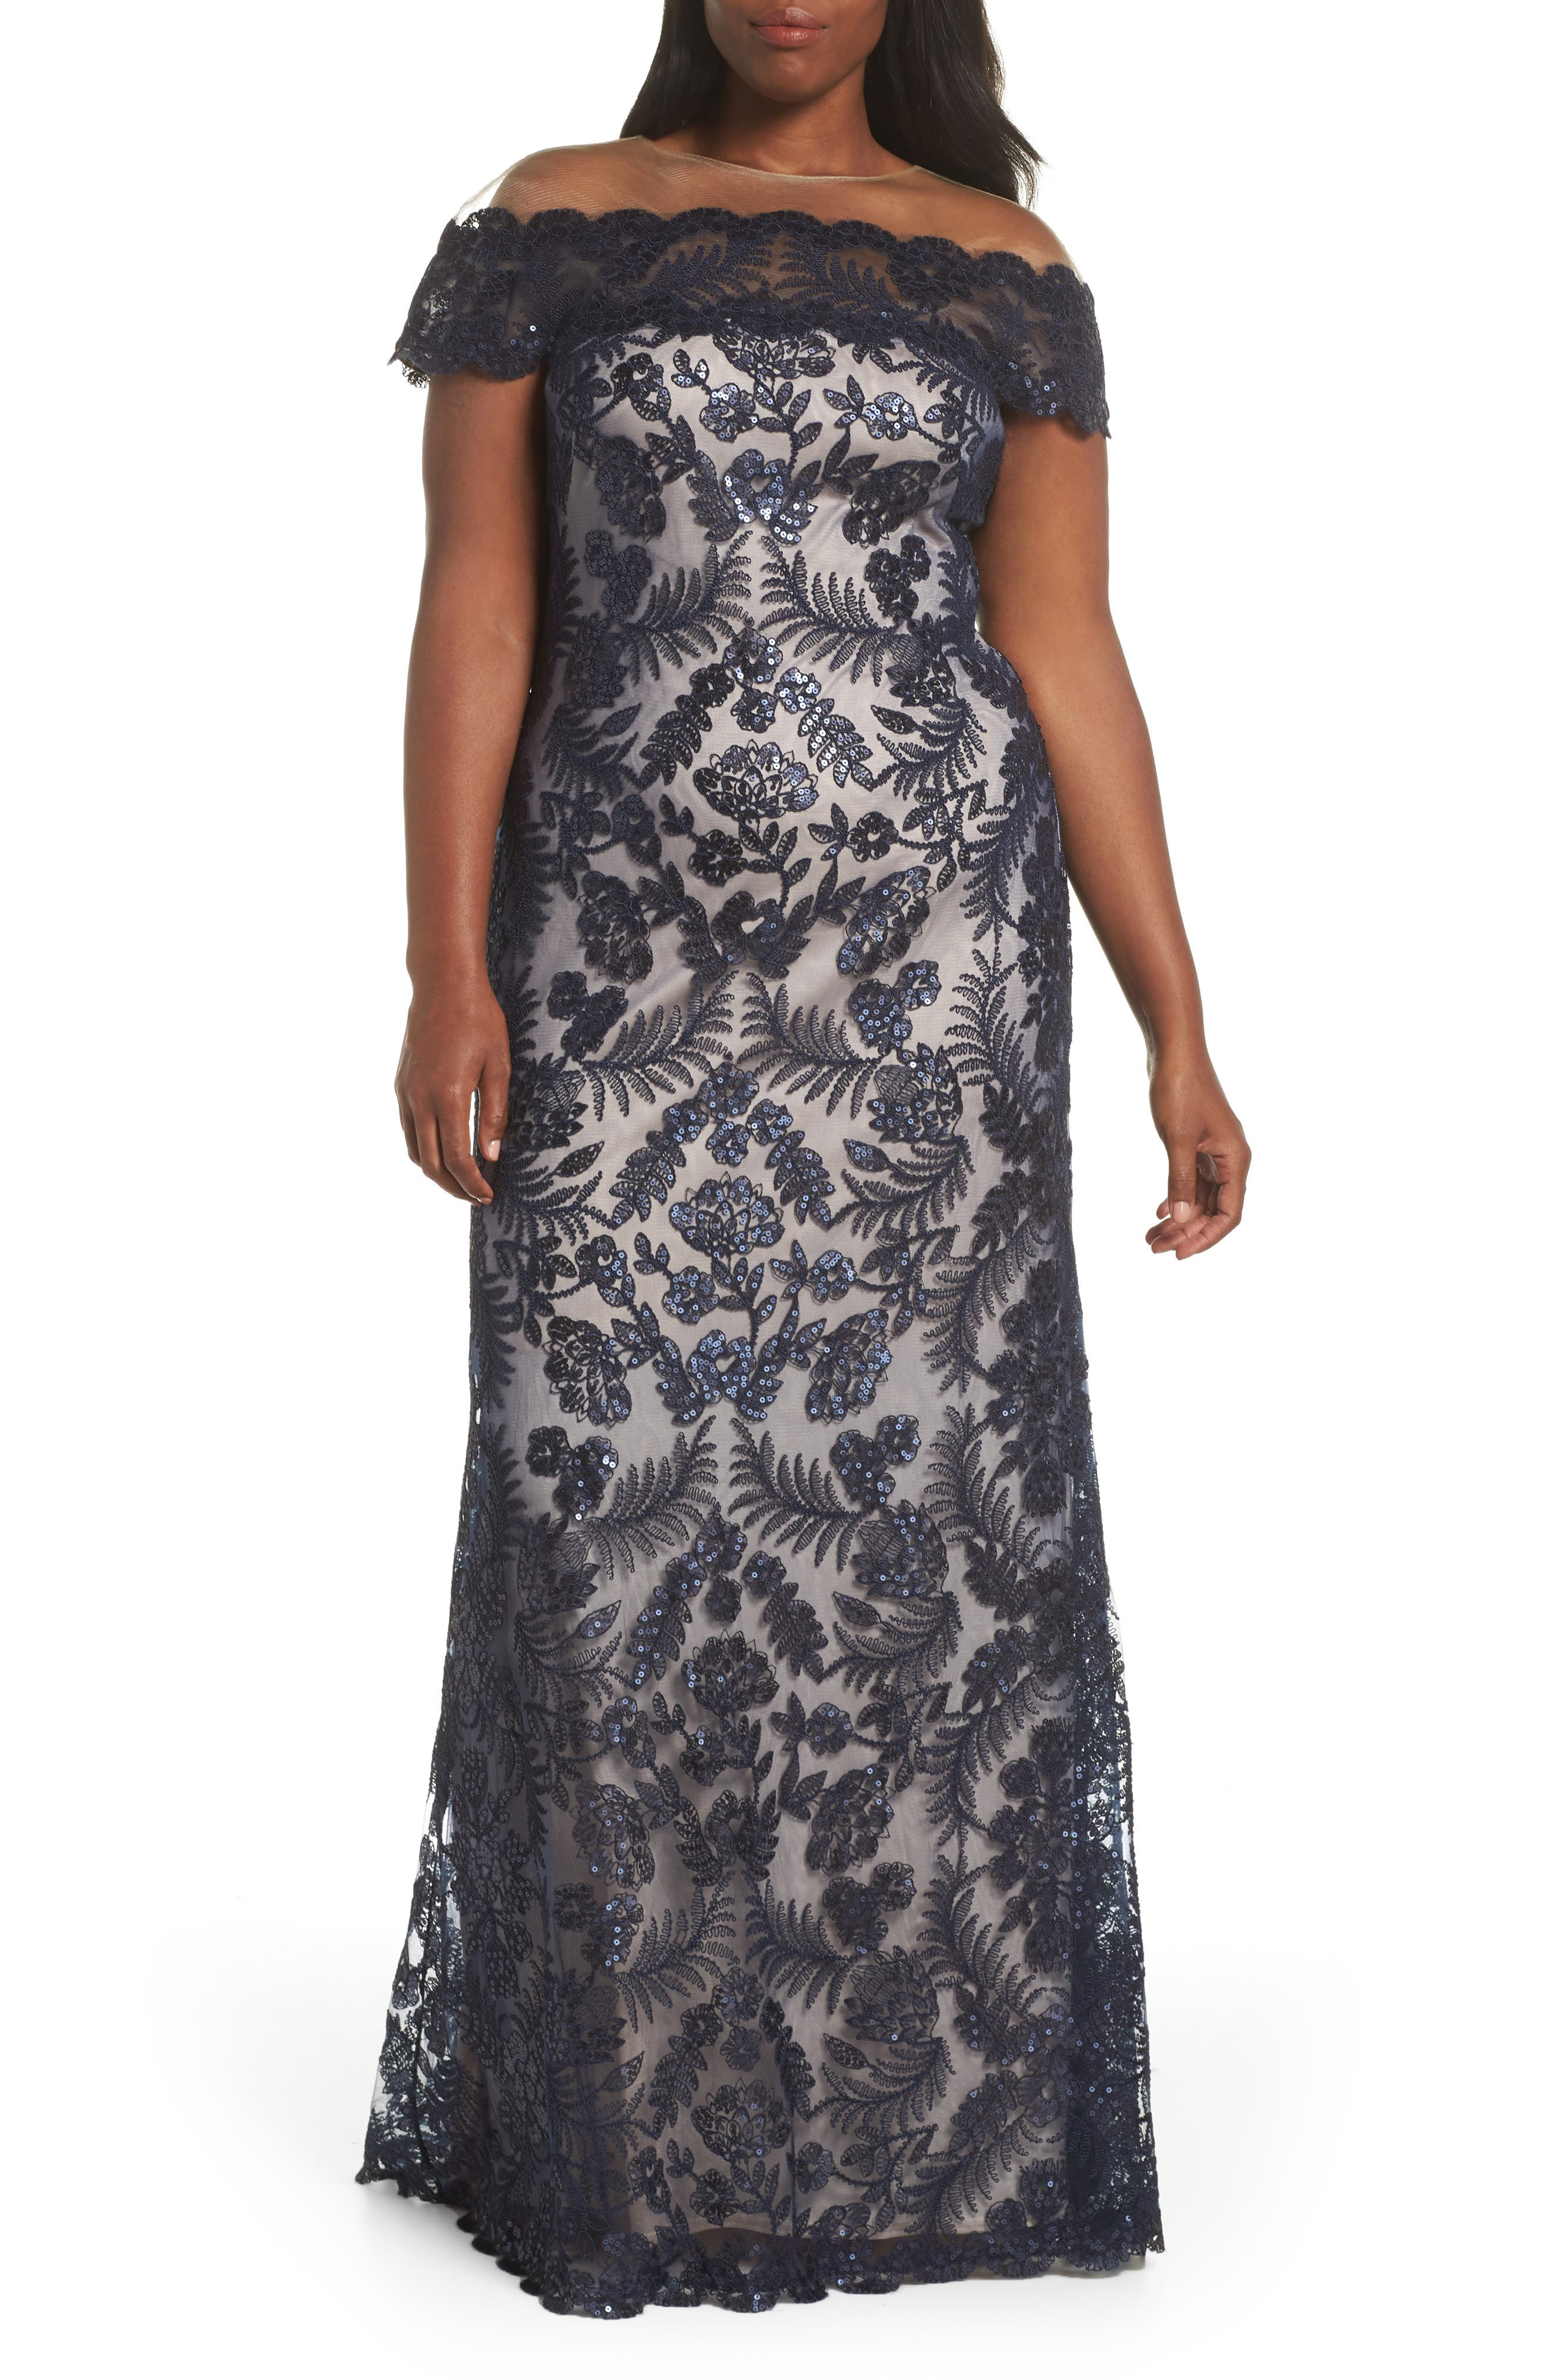 TADASHI SHOJI, Illusion Neck Sequin Lace Gown, Alternate thumbnail 2, color, 410